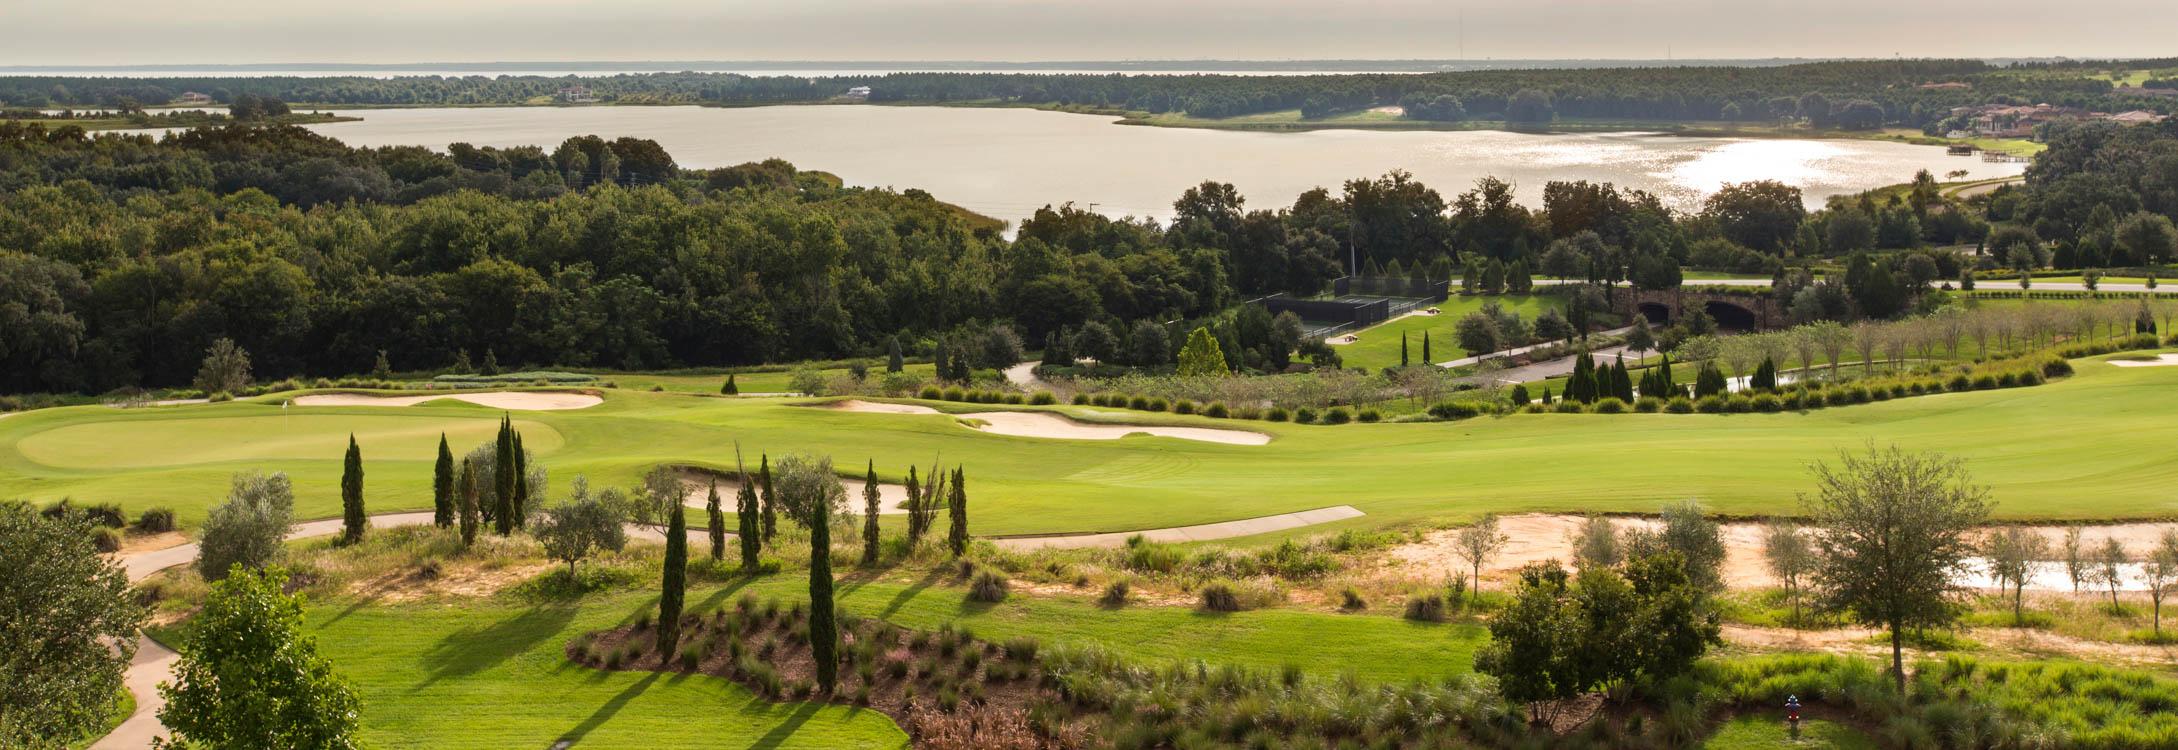 Golf Tournaments Header Image